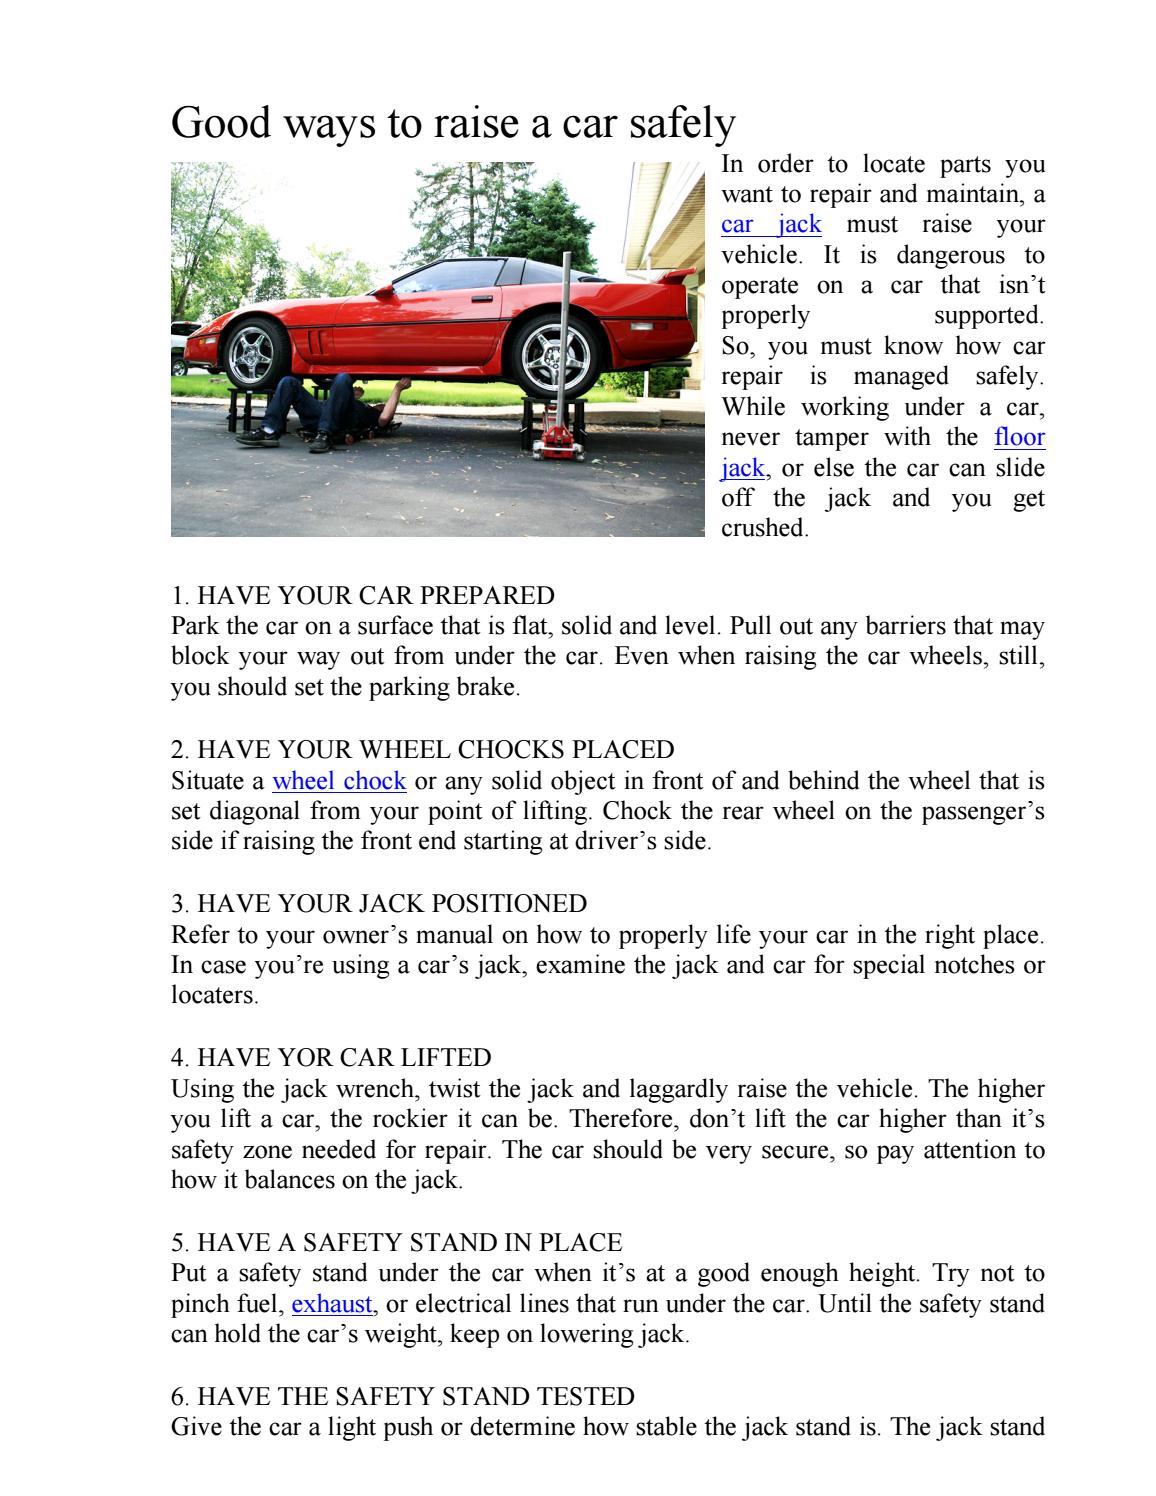 How to raise the car